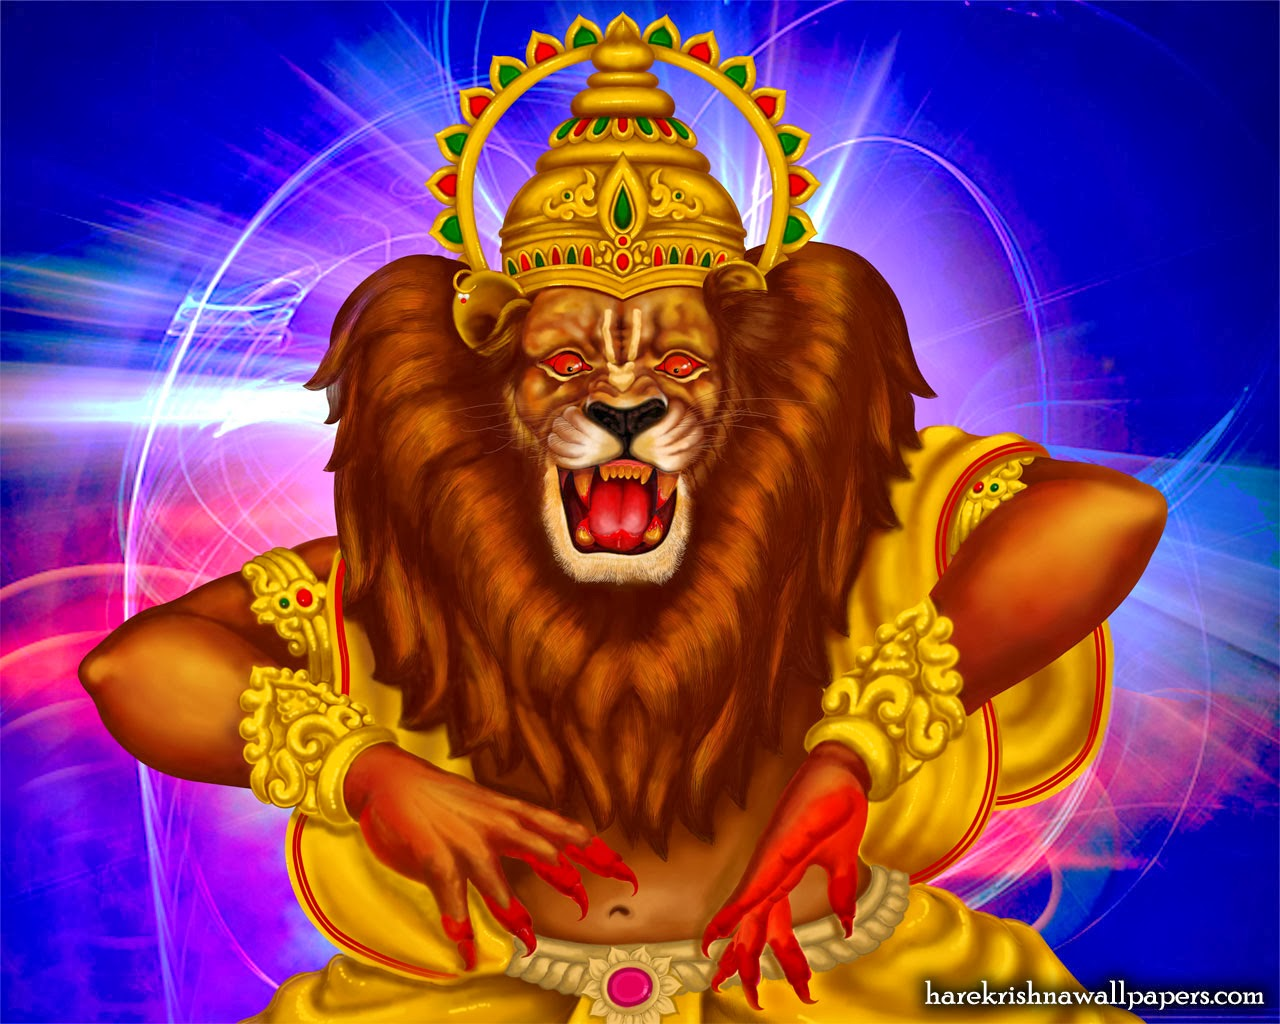 Sai Baba Animated Wallpaper For Mobile Narasimha Wallpapers Hindu God Wallpaper